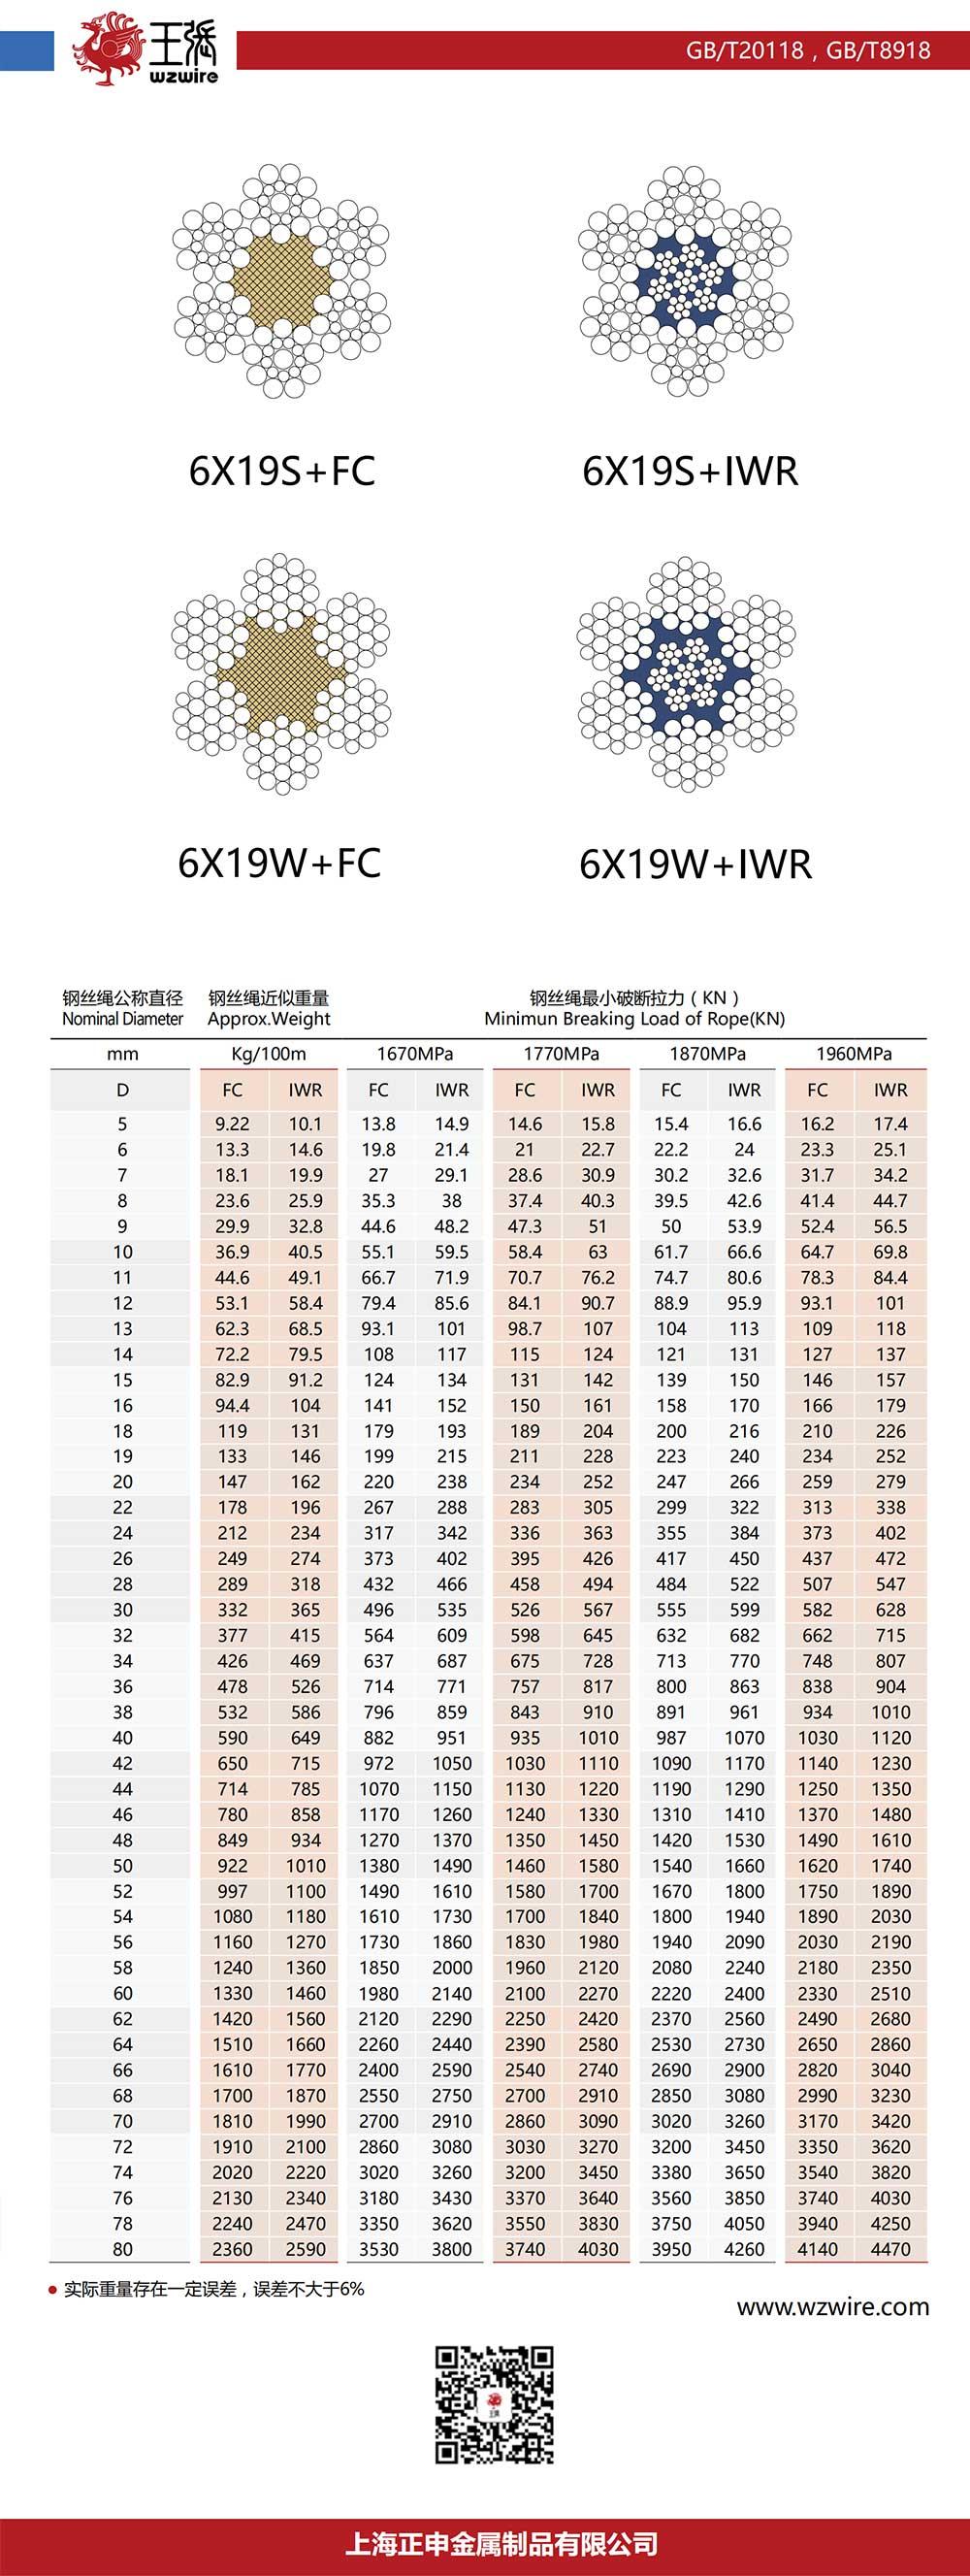 鋼絲繩6X19S+FC、6X19S+IWR、6X19W+FC、6X19W+IWR價格,鋼絲繩6X19S+FC、6X19S+IWR、6X19W+FC、6X19W+IWR批發,鋼絲繩6X19S+FC、6X19S+IWR、6X19W+FC、6X19W+IWR公司